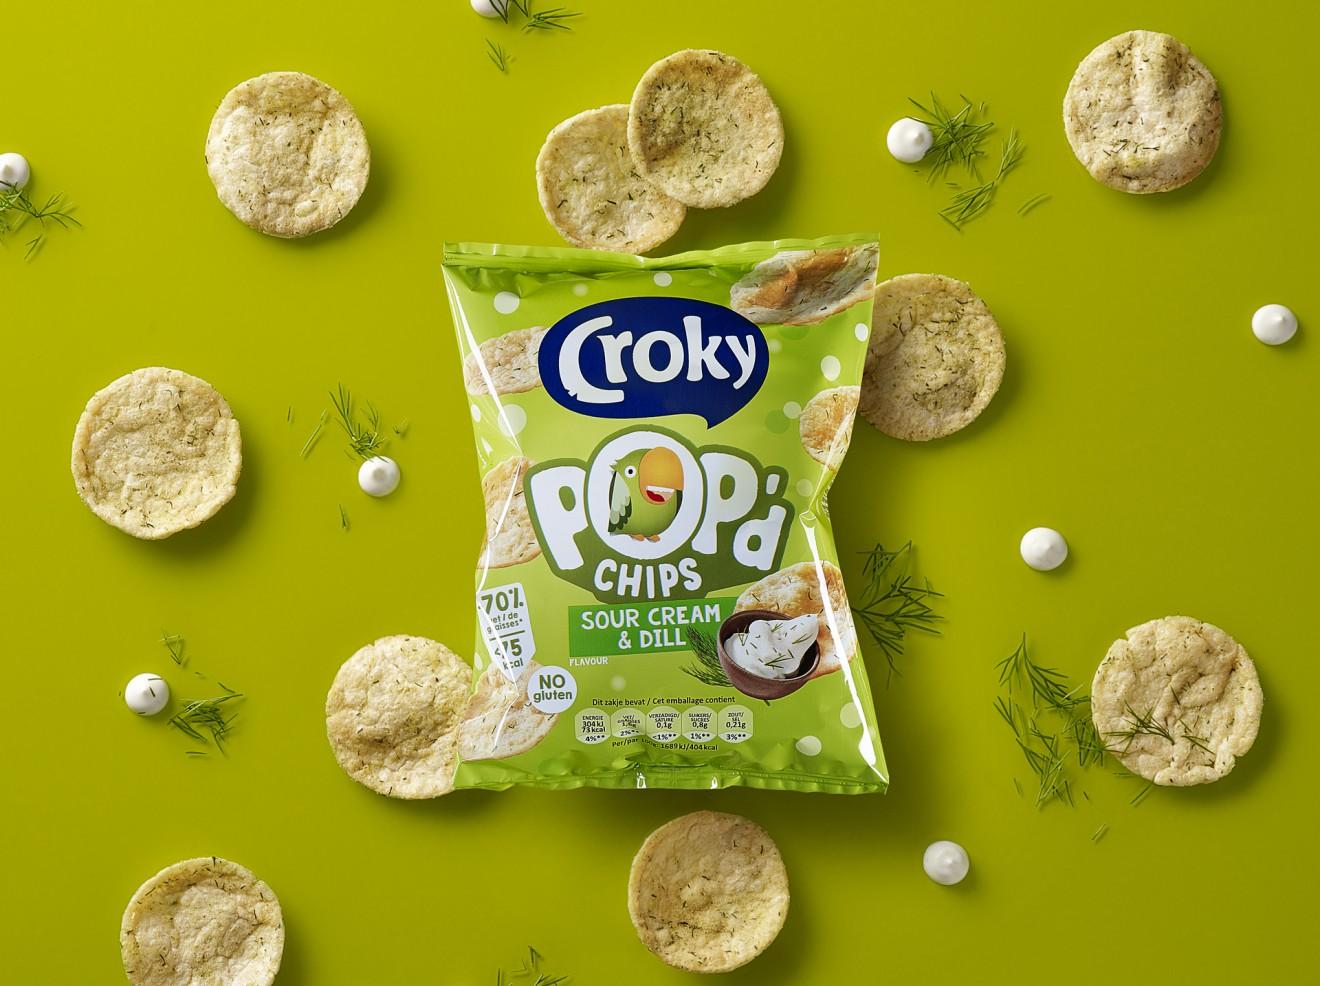 Quatre Mains package design - branding, packaging design, foil, dill, sour cream